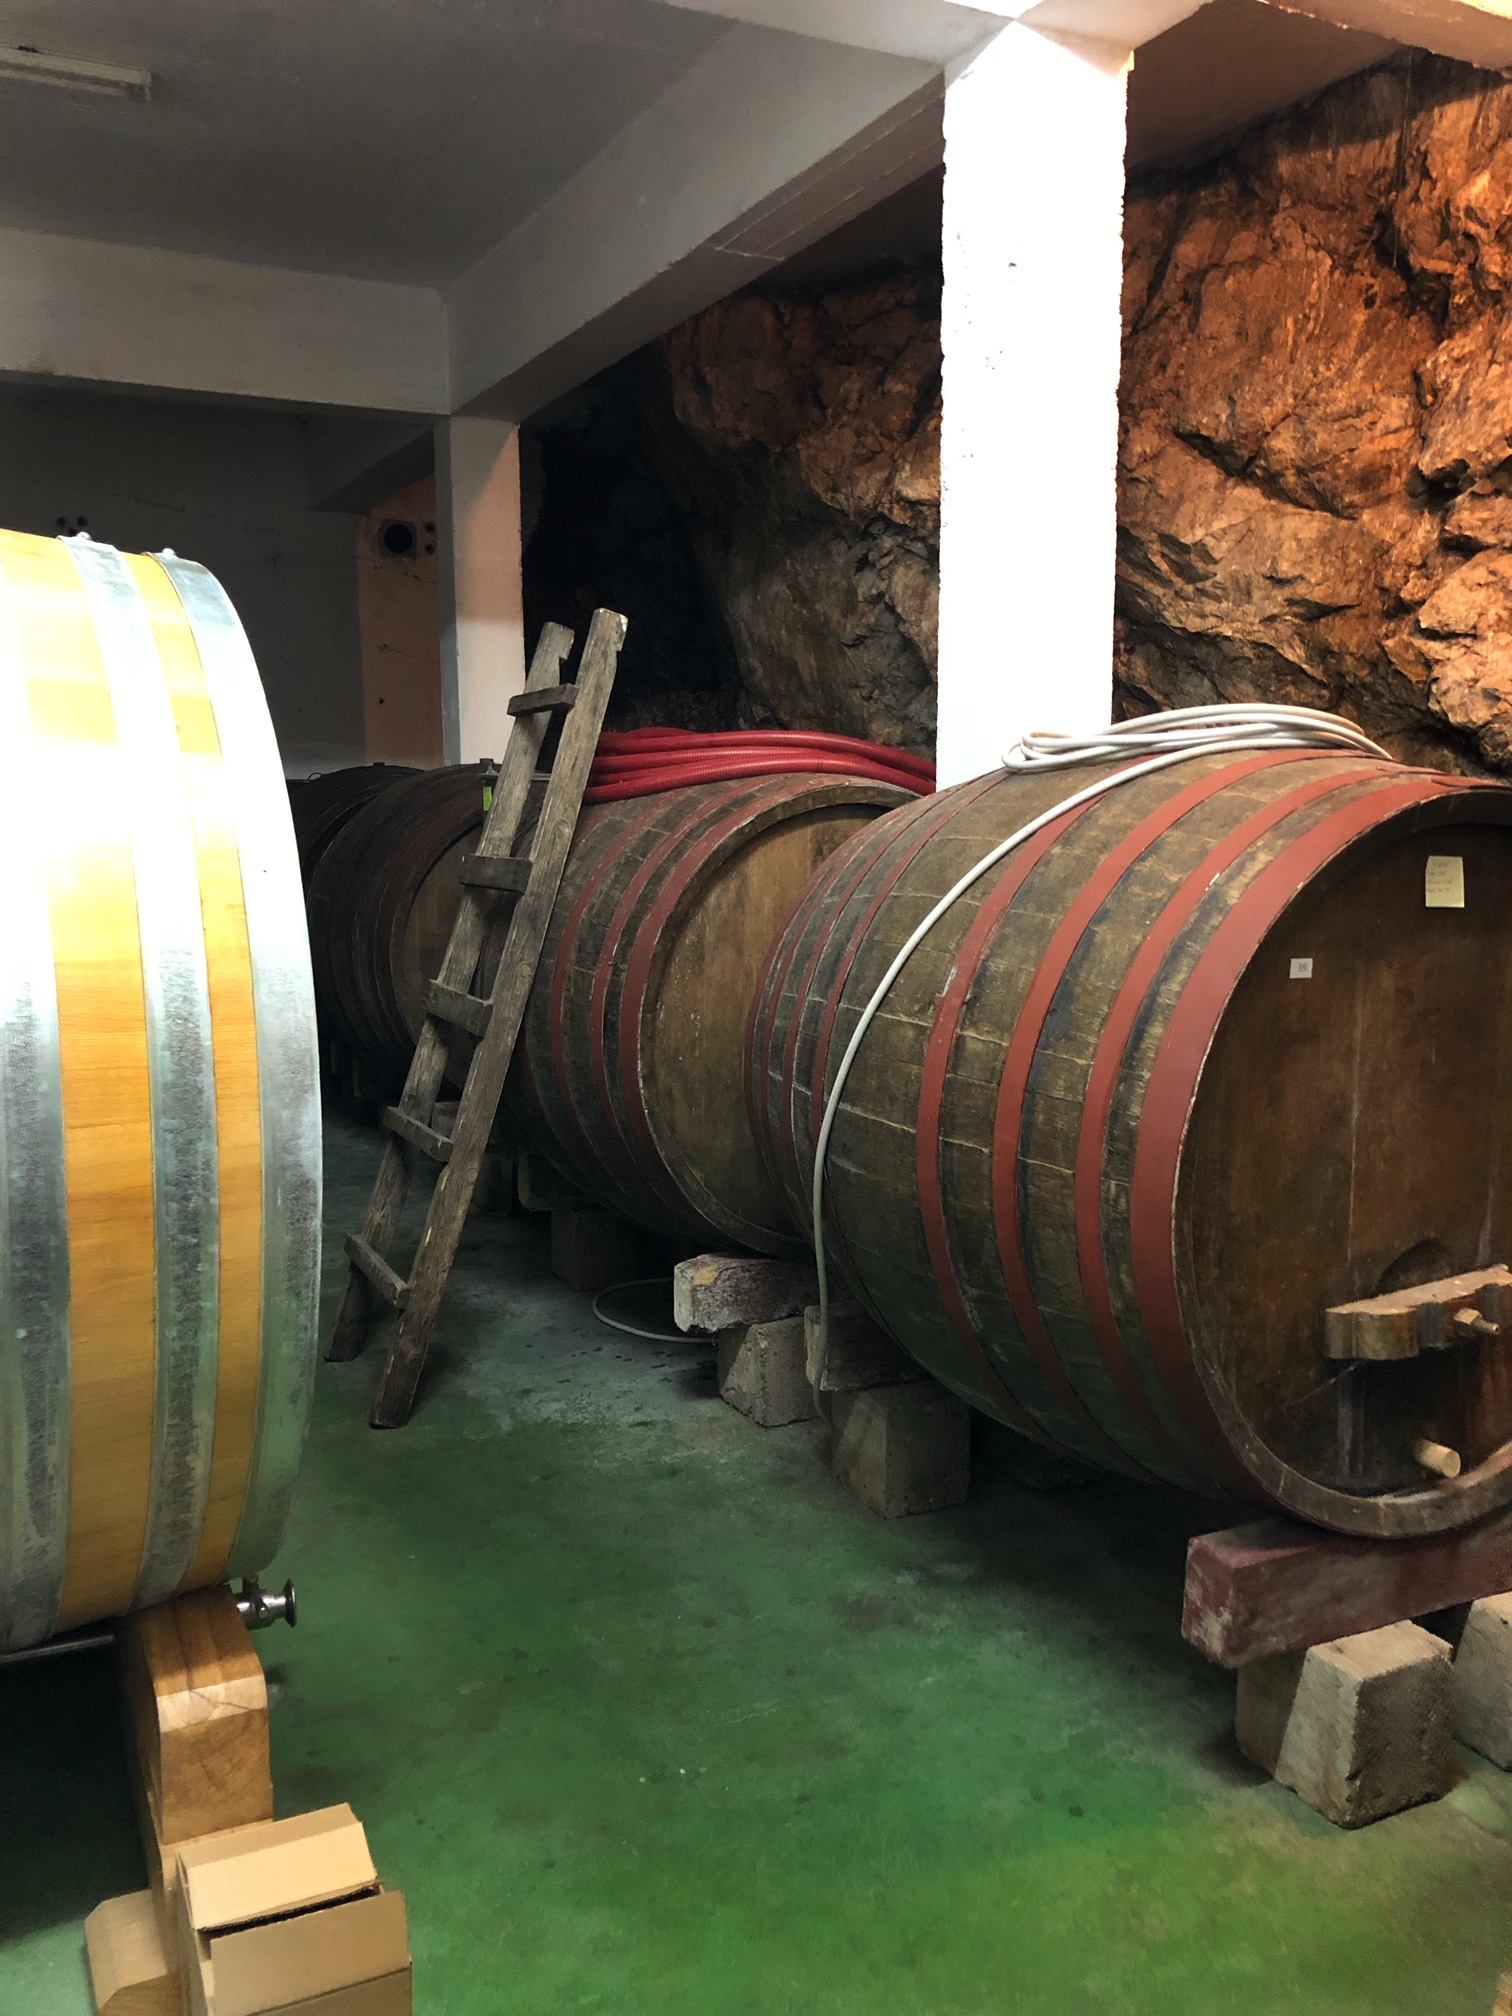 milos winery, croatia, the-alyst.com